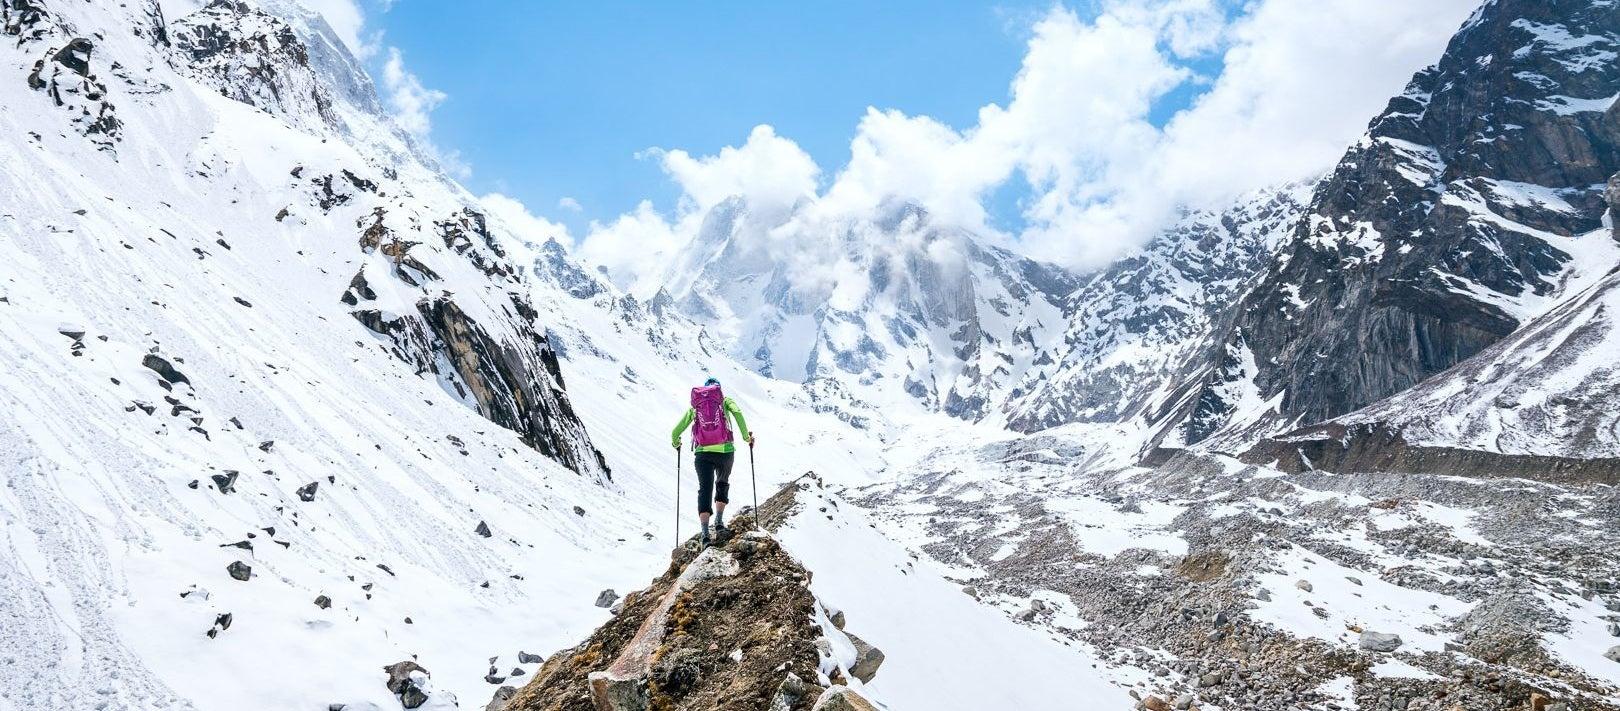 A Himalayan Fantasy Trip With Dan And Janine Patitucci